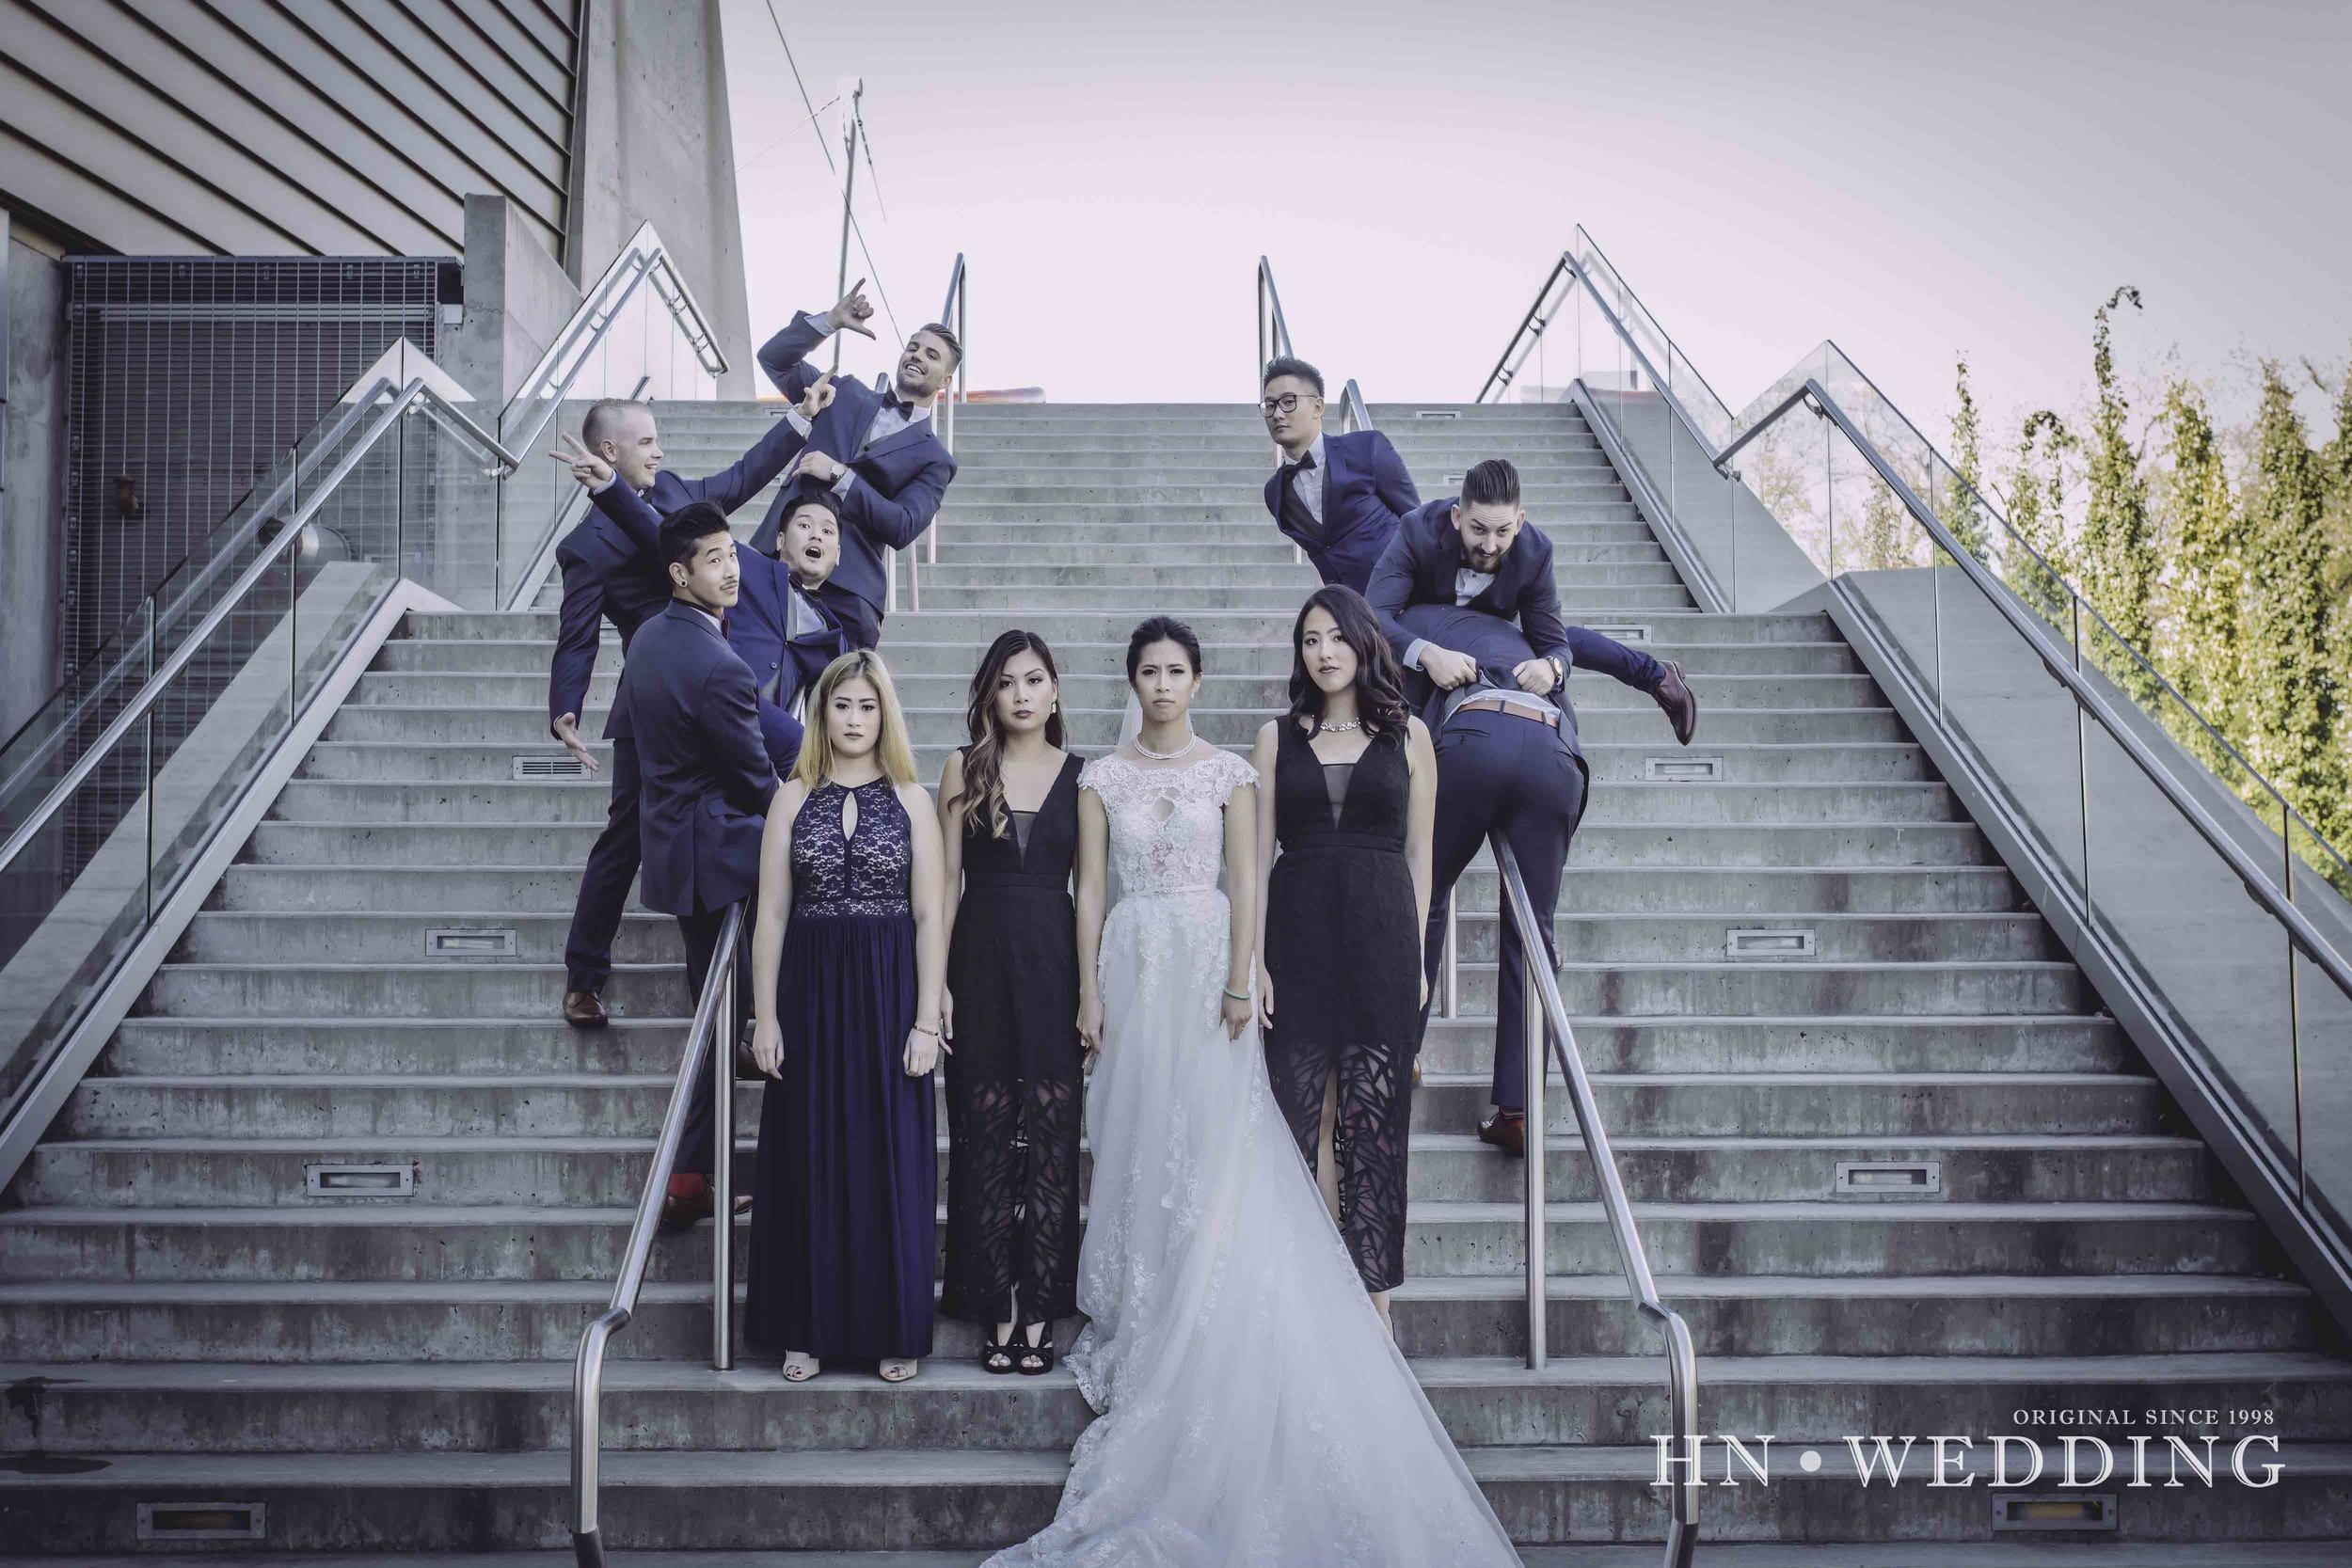 HNwedding-20160815-wedding-024.jpg